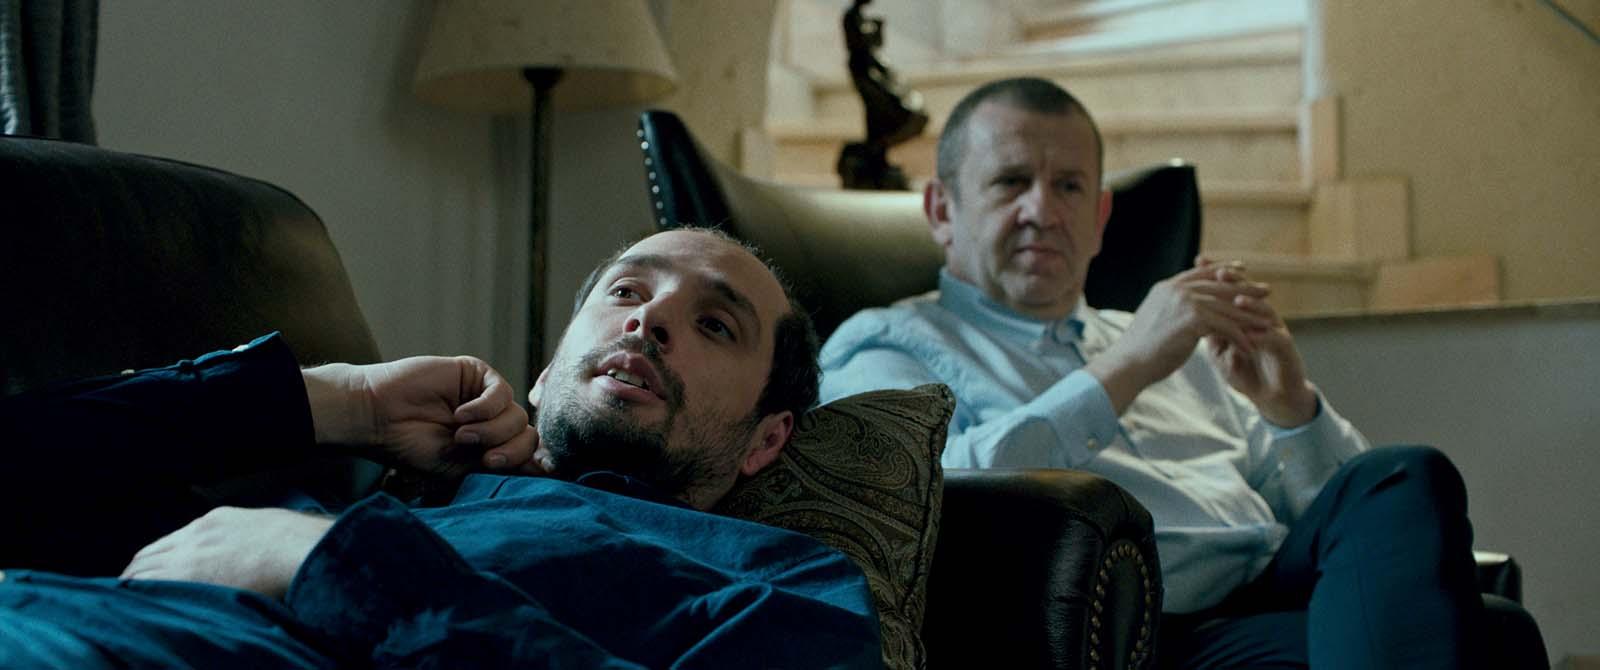 Adrian Titieni and Mircea Postelnicu in Ana, mon amour (2017)